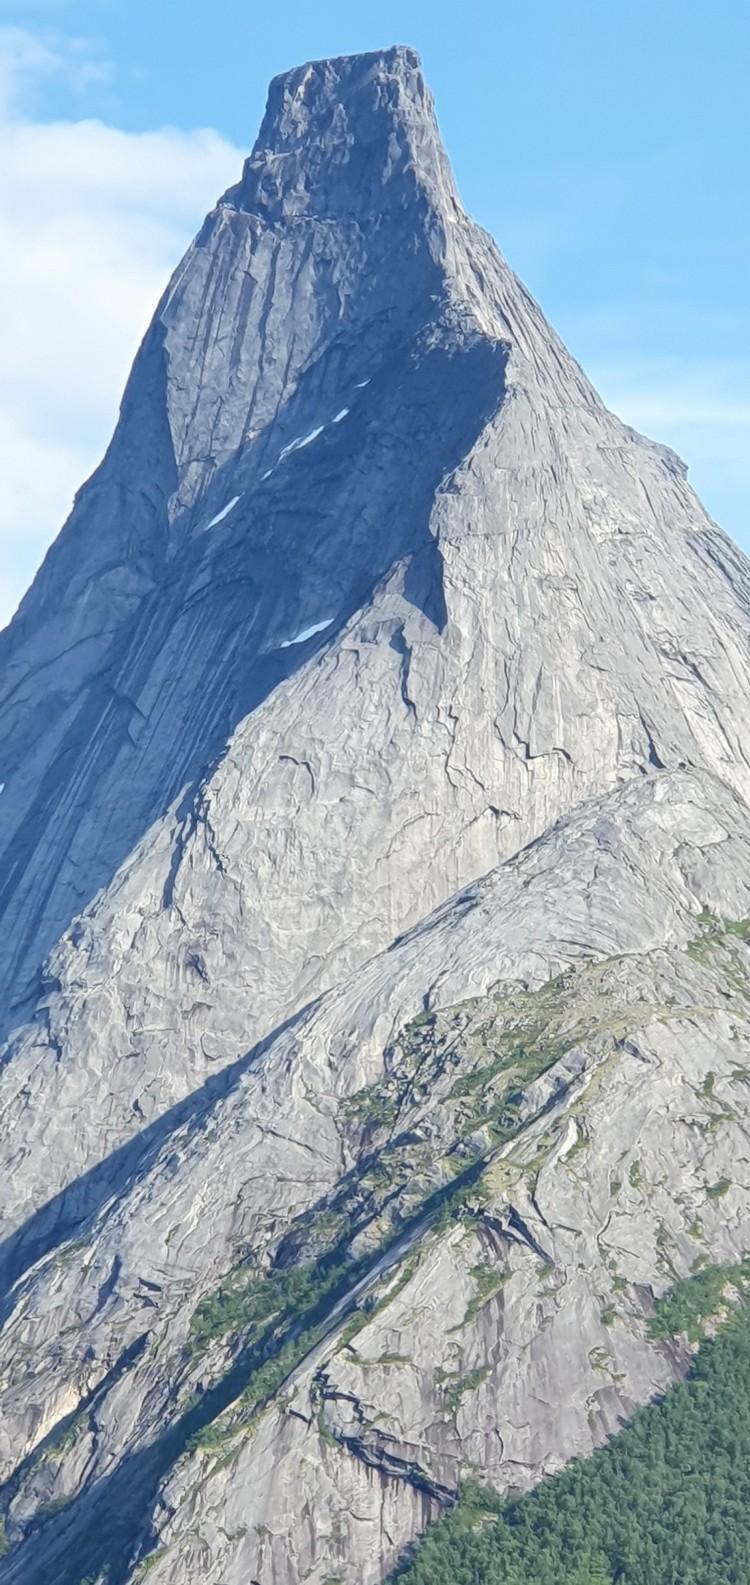 La Pirámide de Stetind. Foto: Robert Jasper